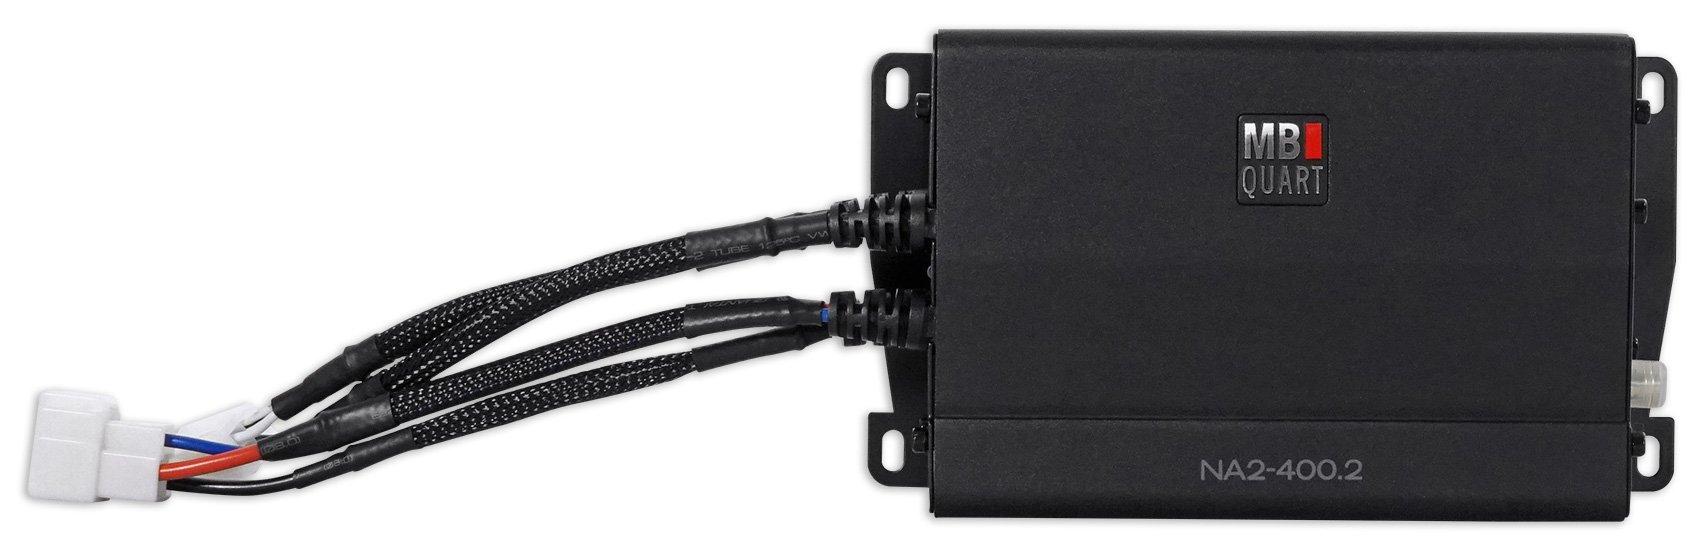 MB QUART NA2-400.2 400w 2-Channel Amplifier Amp For Polaris/ATV/UTV/RZR/CART by MB Quart (Image #6)